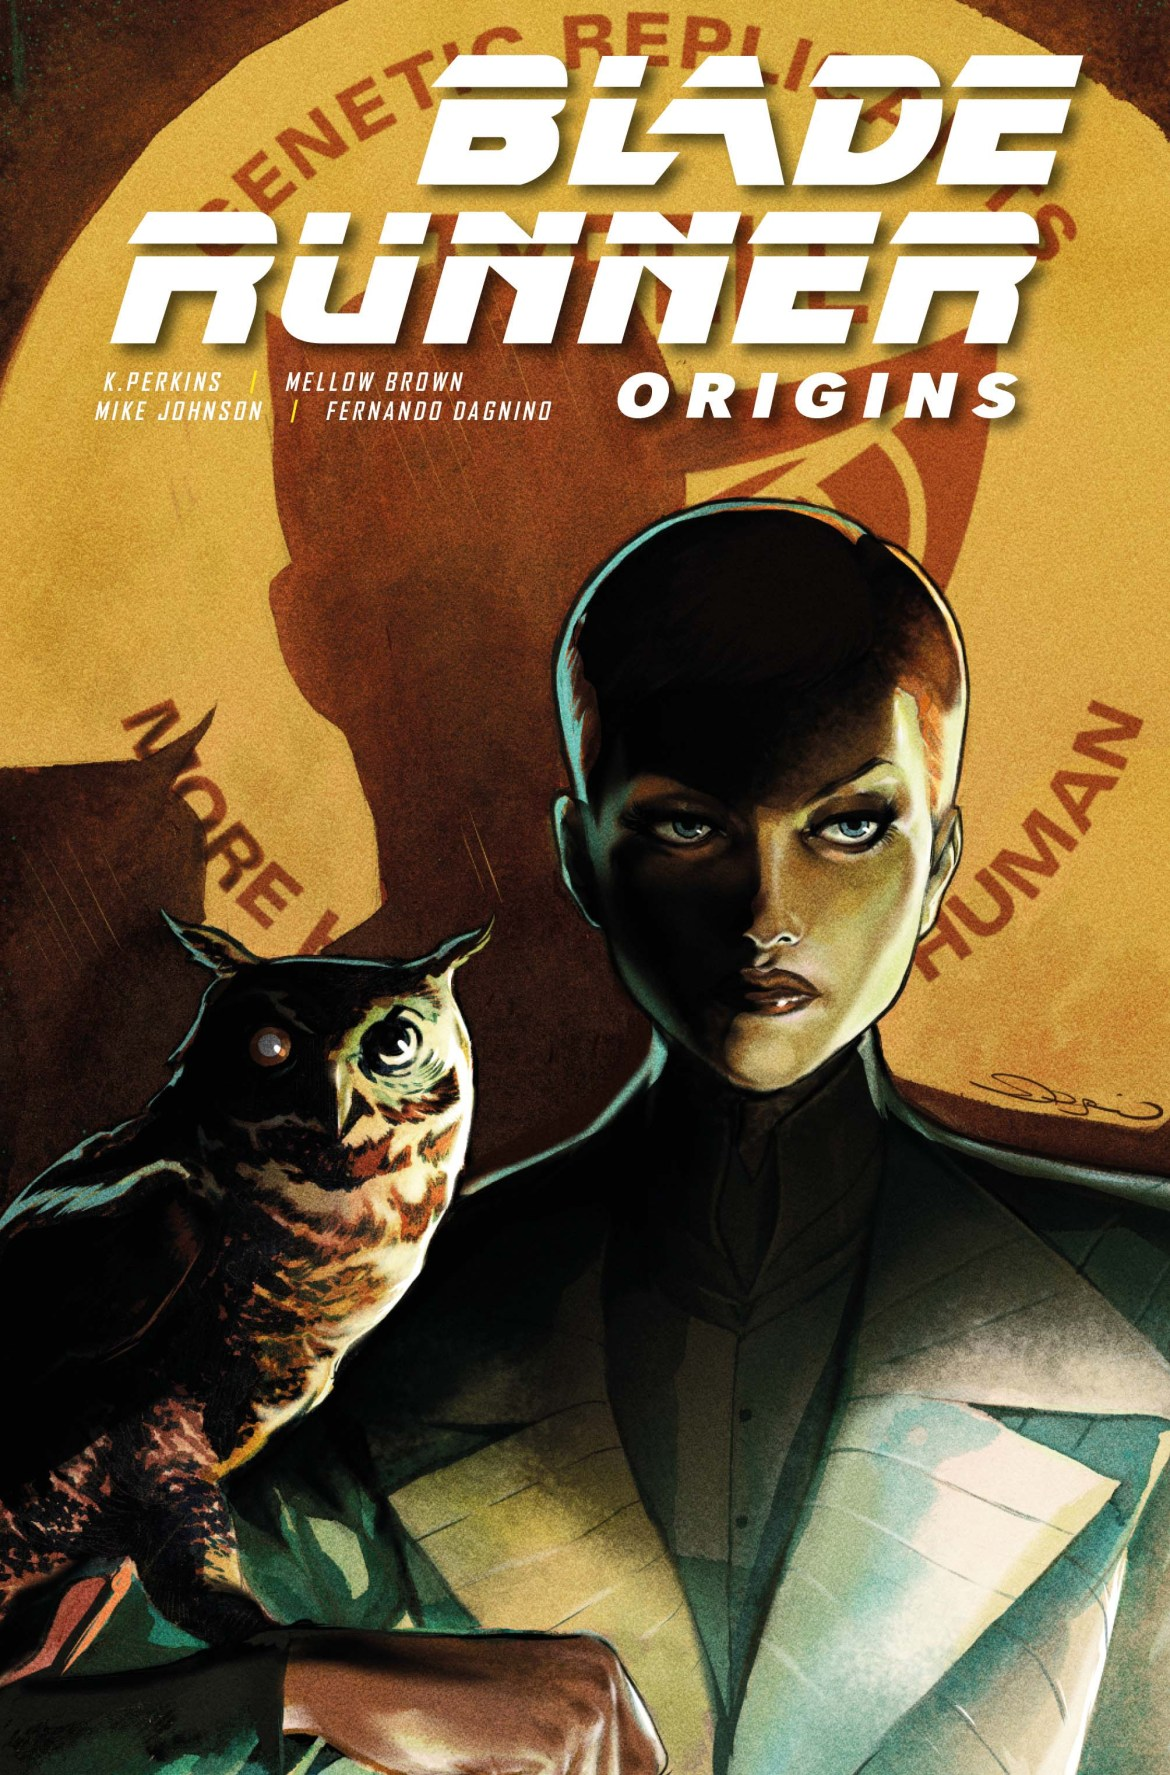 Blade-Runner-Origins-2C-DAGNINO Titan Comics March 2021 Solicitations